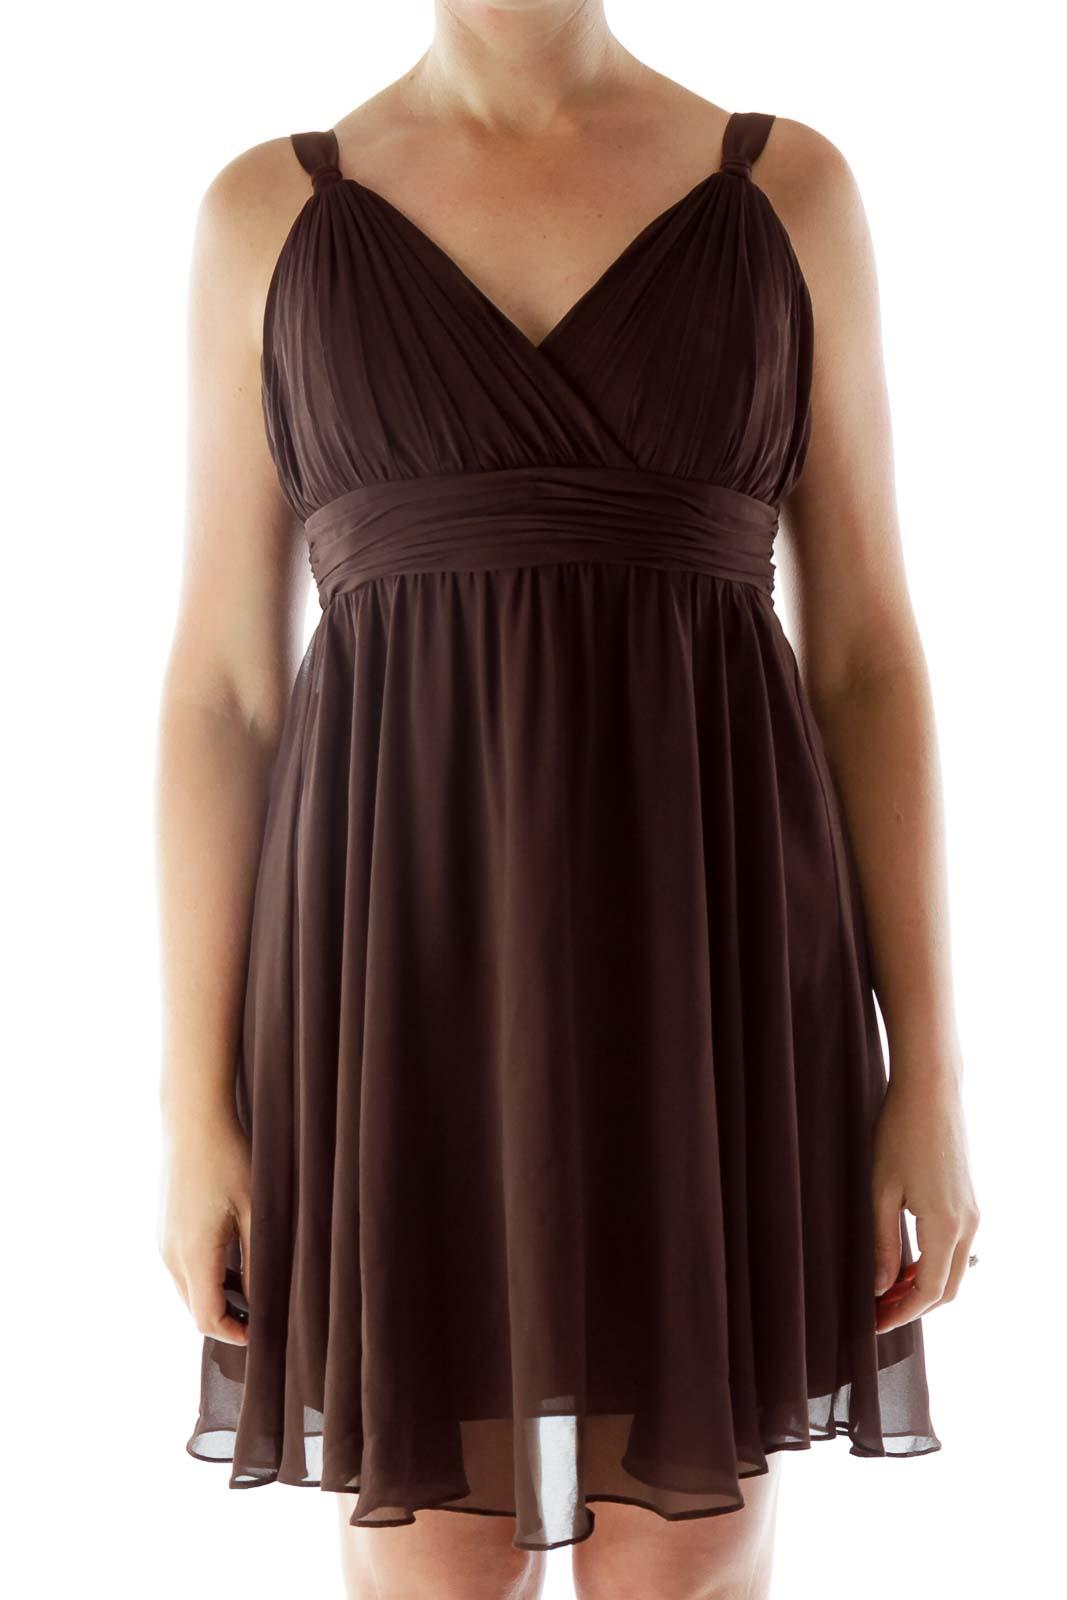 Brown V-Neck Chiffon Dress Front